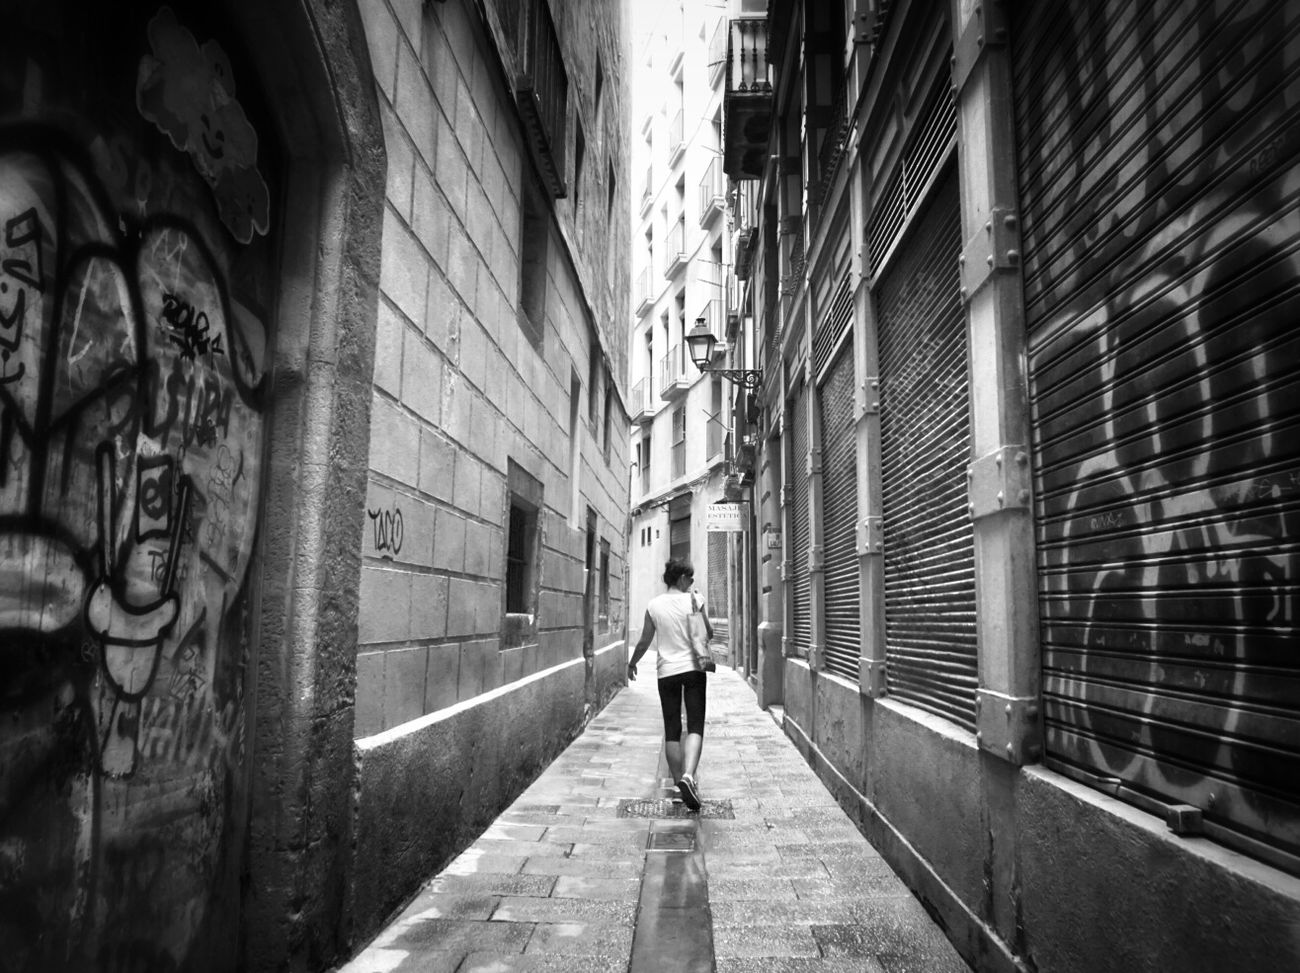 Blackandwhite Monochrome Streetphotography Mi Serie Barcelona